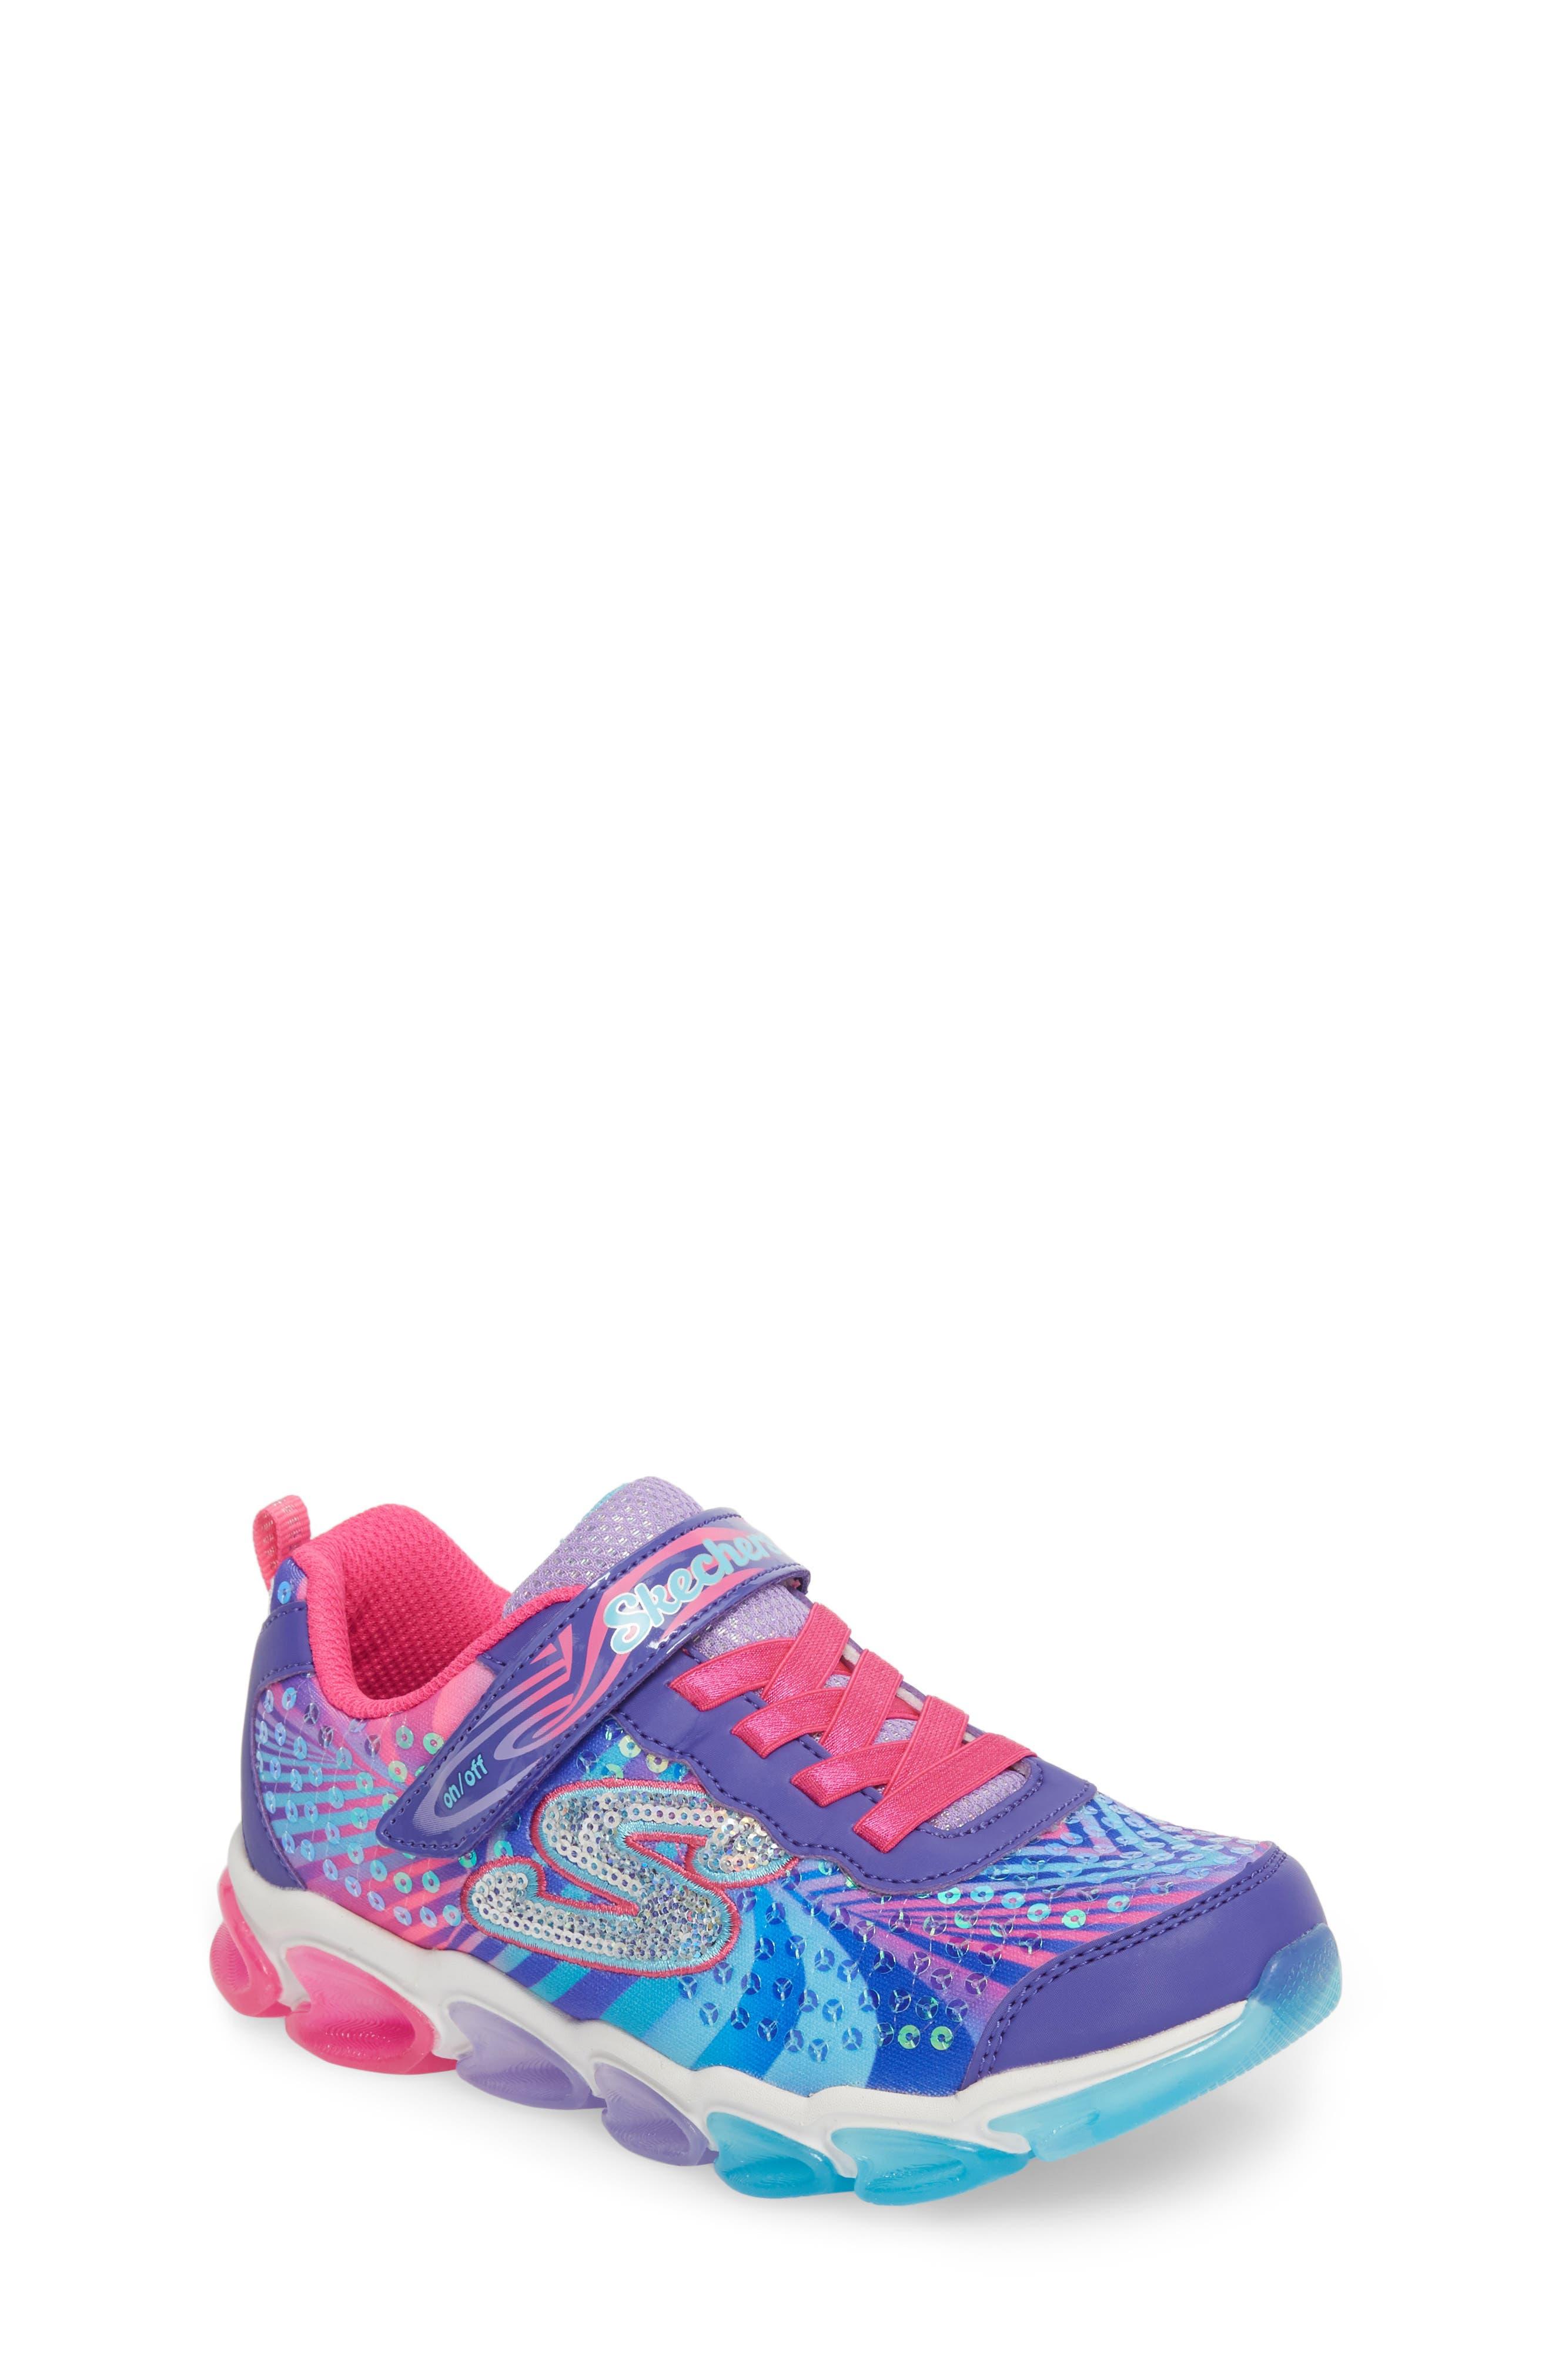 Jelly Beams Light-Up Sneaker,                             Main thumbnail 1, color,                             Purple/ Multi